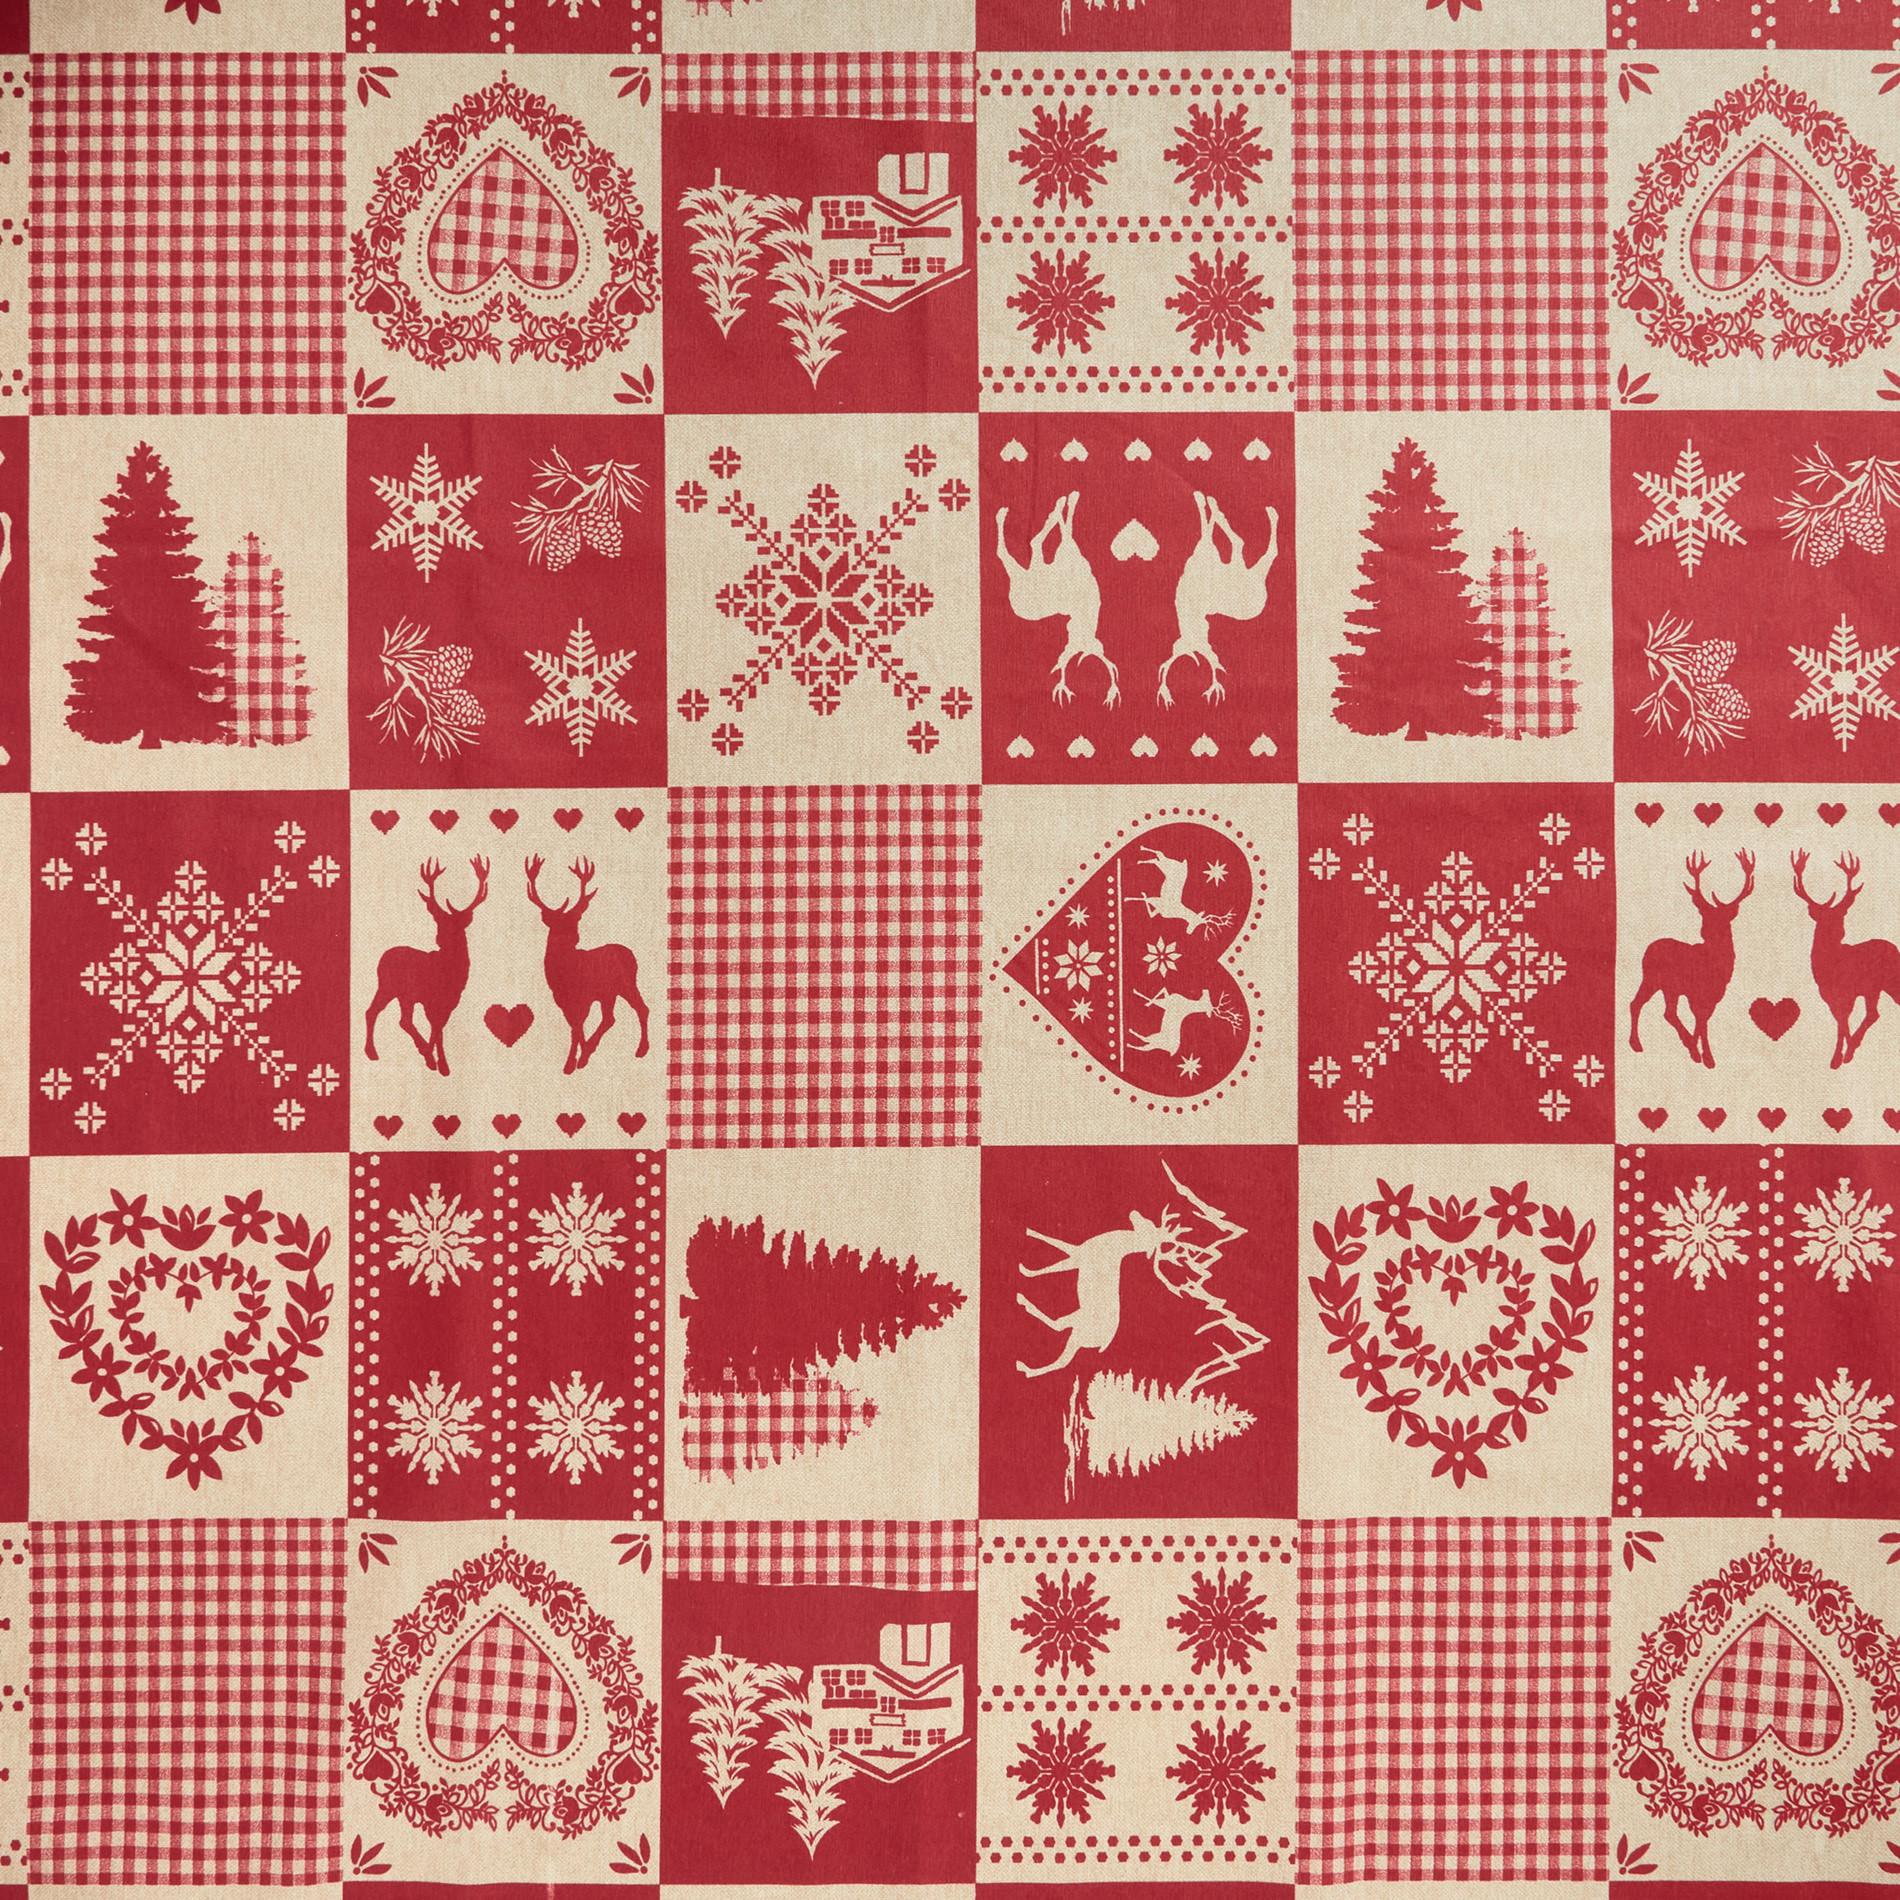 Tovaglia tessuto idrorepellente stampa patchwork, Rosso, large image number 1